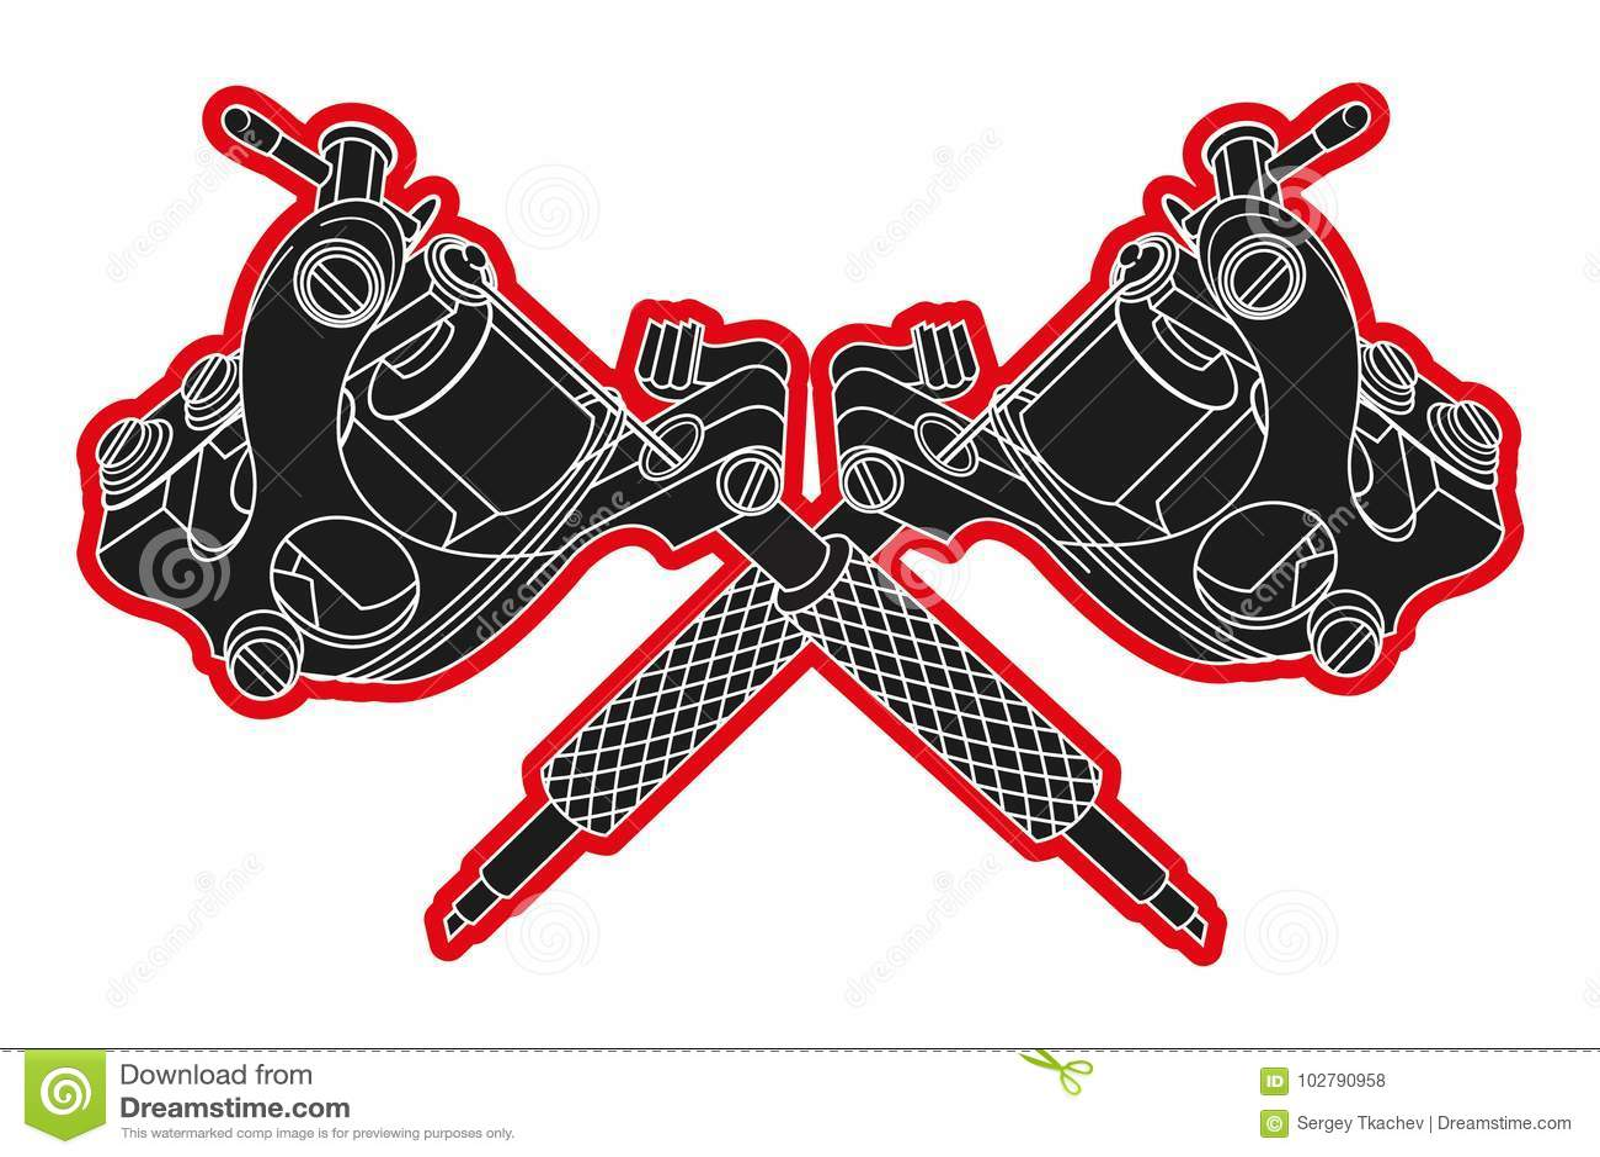 Tattoo machines stock vector. Illustration of element - 102790958